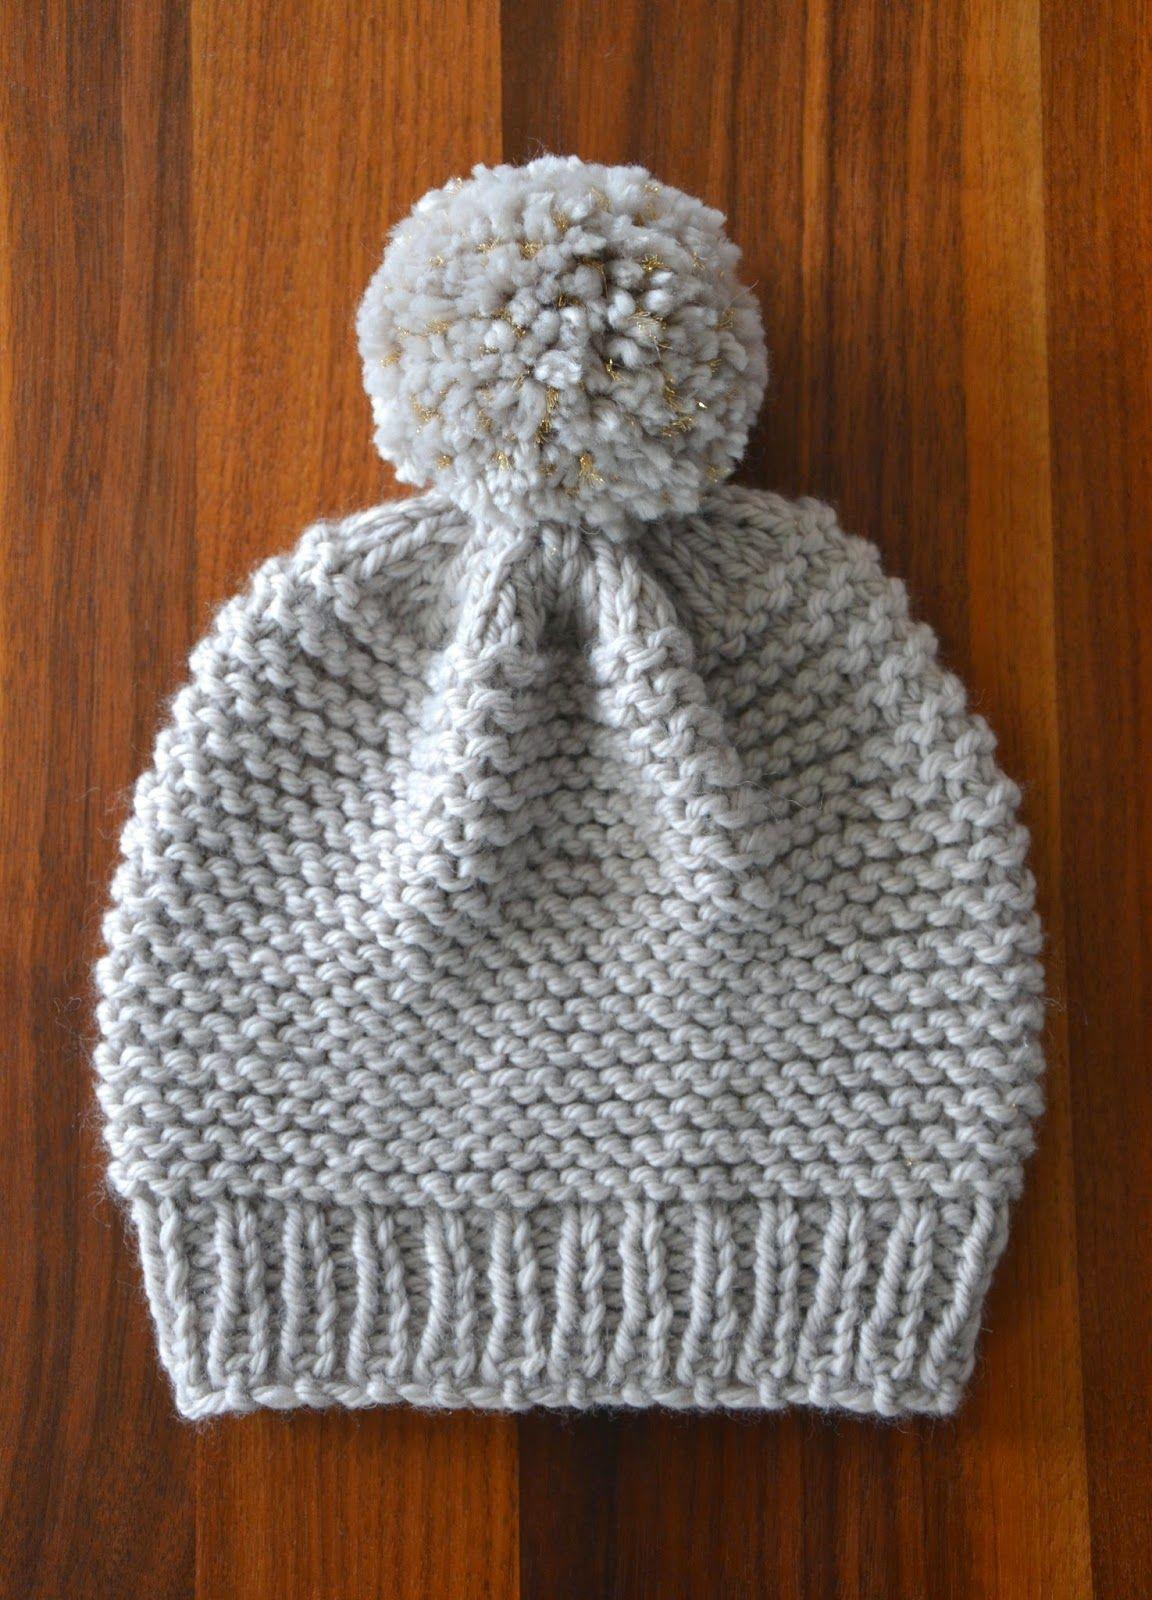 Bonnet Crochet   Bonnet Rosé Nova Tressé En Tricot Crochet Avec ... b8b8ebdd0b2